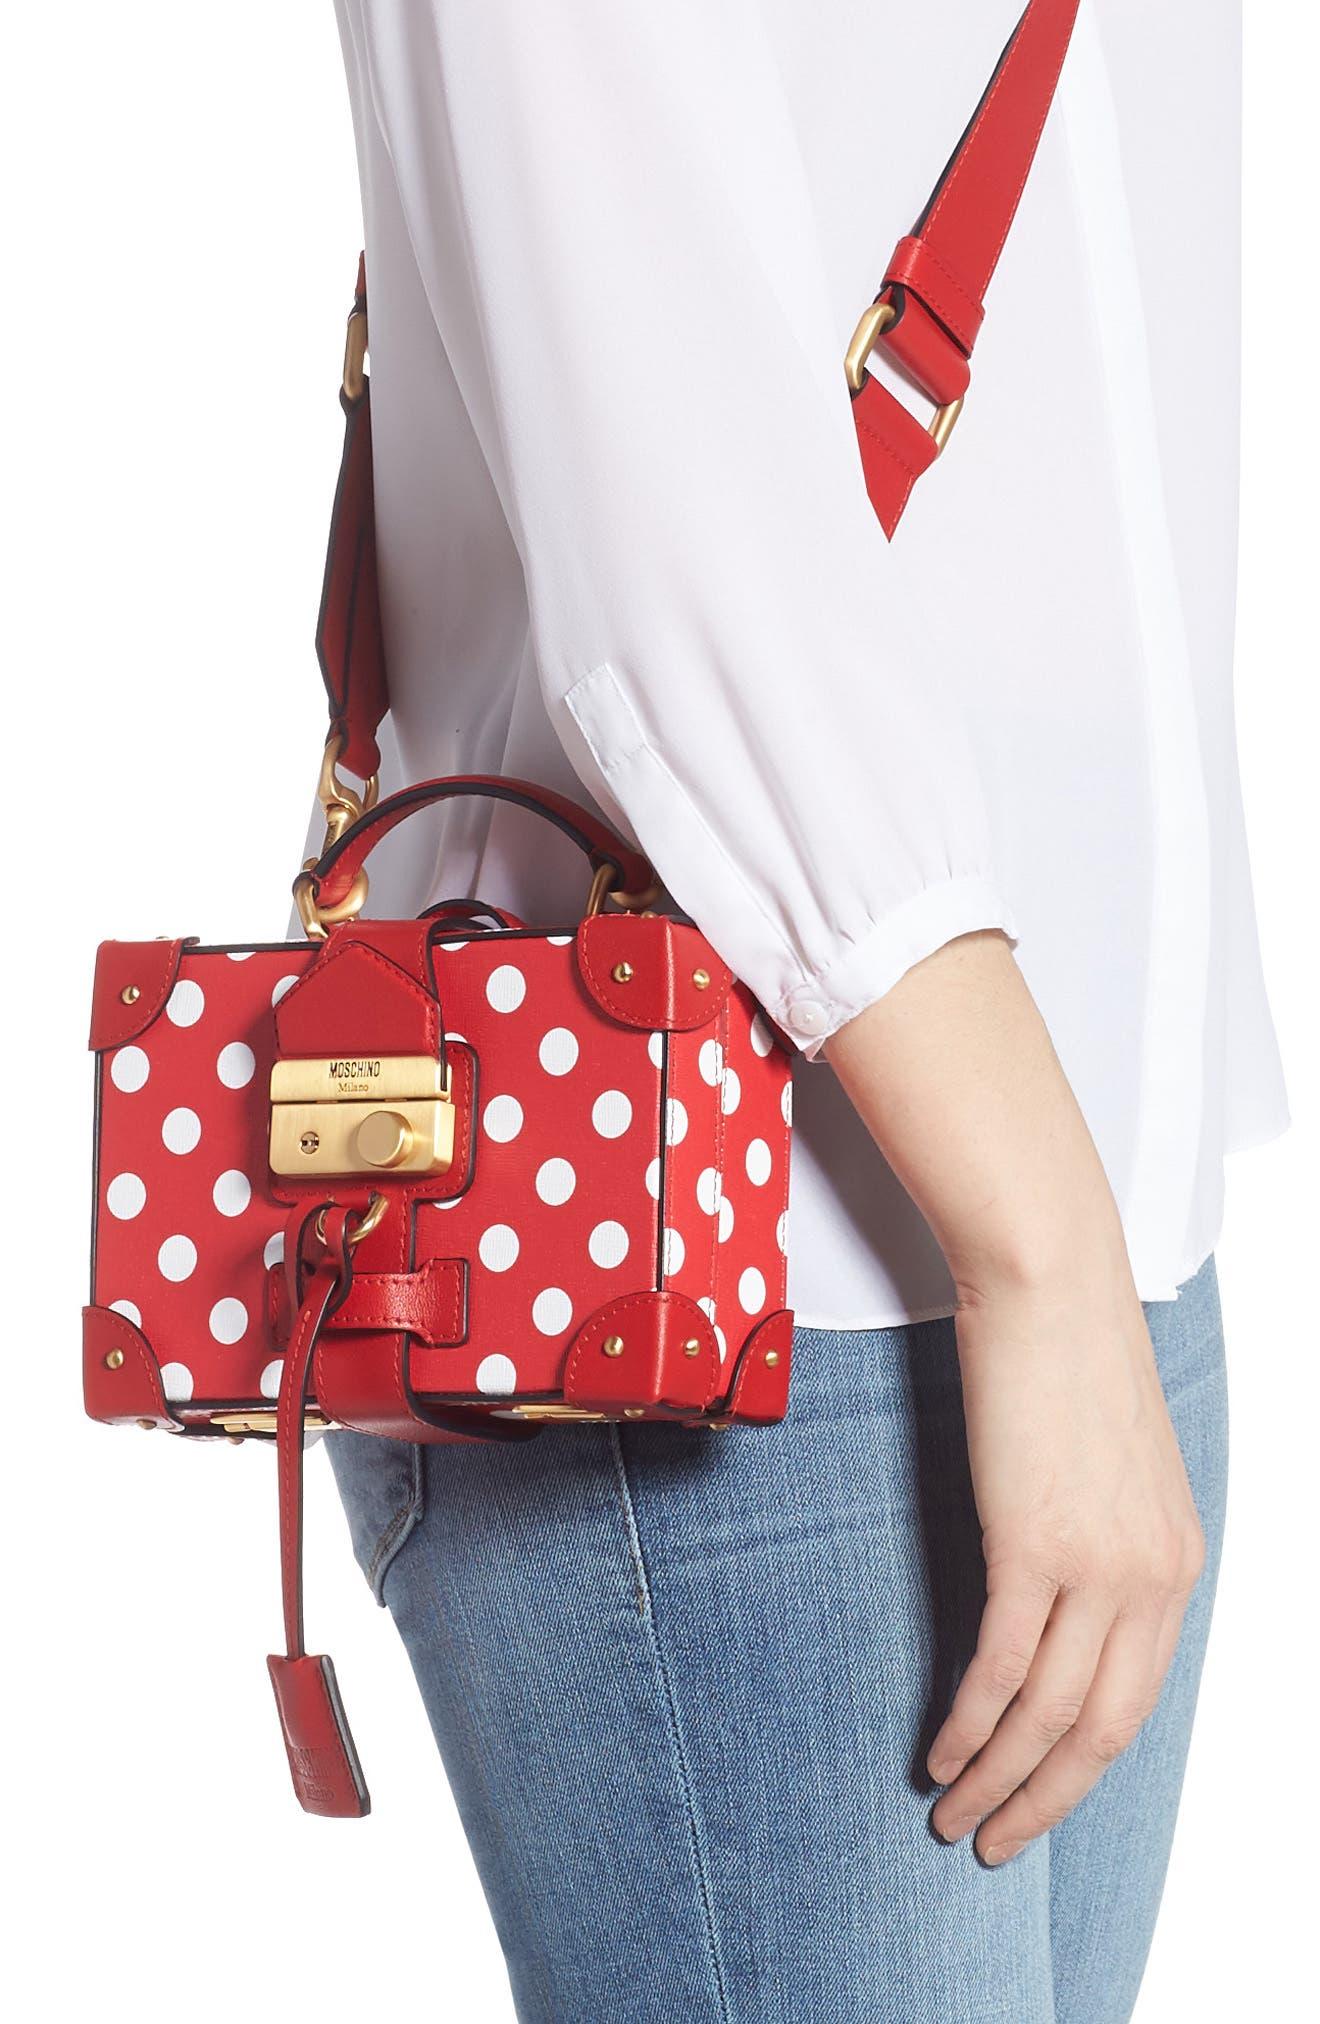 MOSCHINO, Polka Dot Box Leather Crossbody Bag, Alternate thumbnail 2, color, RED